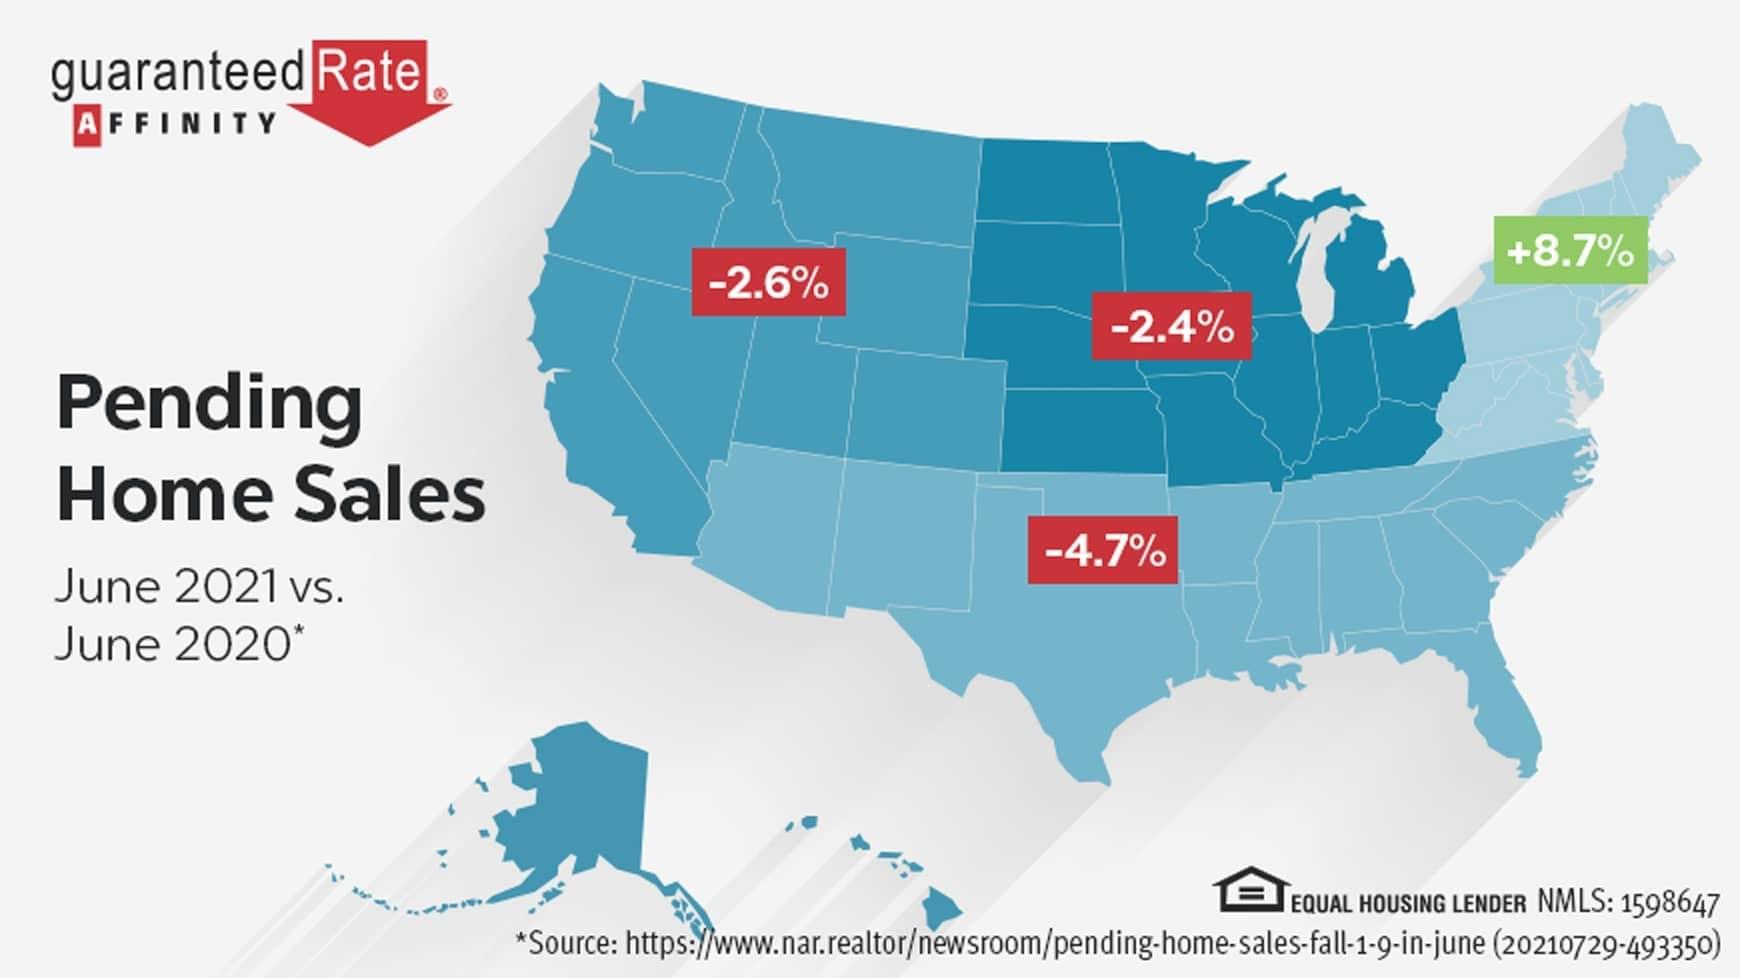 Pending home sales decline slightly in June